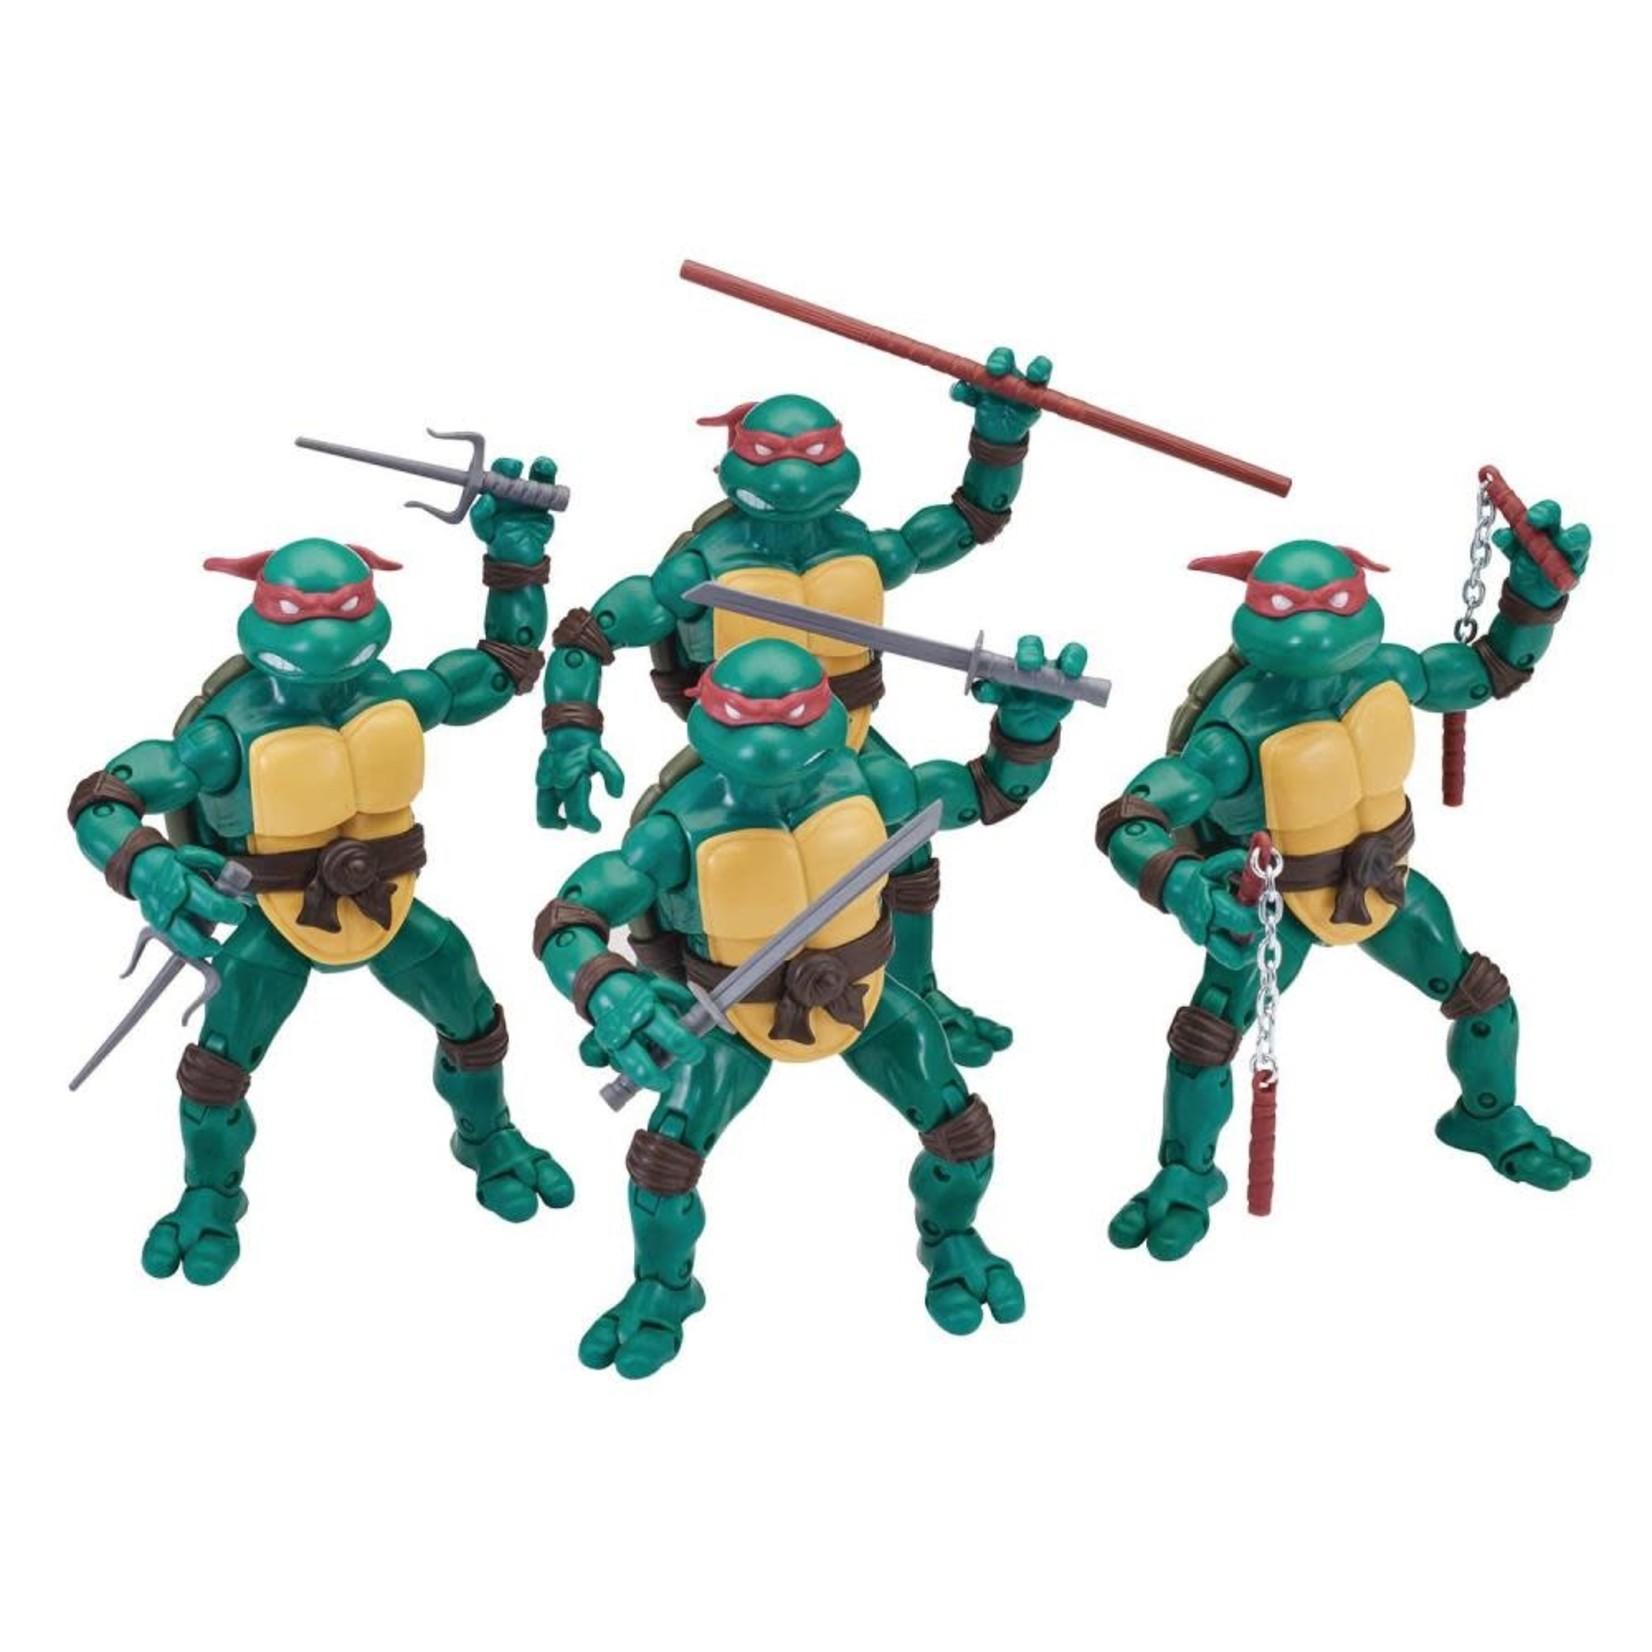 playmates TMNT Ninja Elite Series PX Previews Exclusive - Donatello